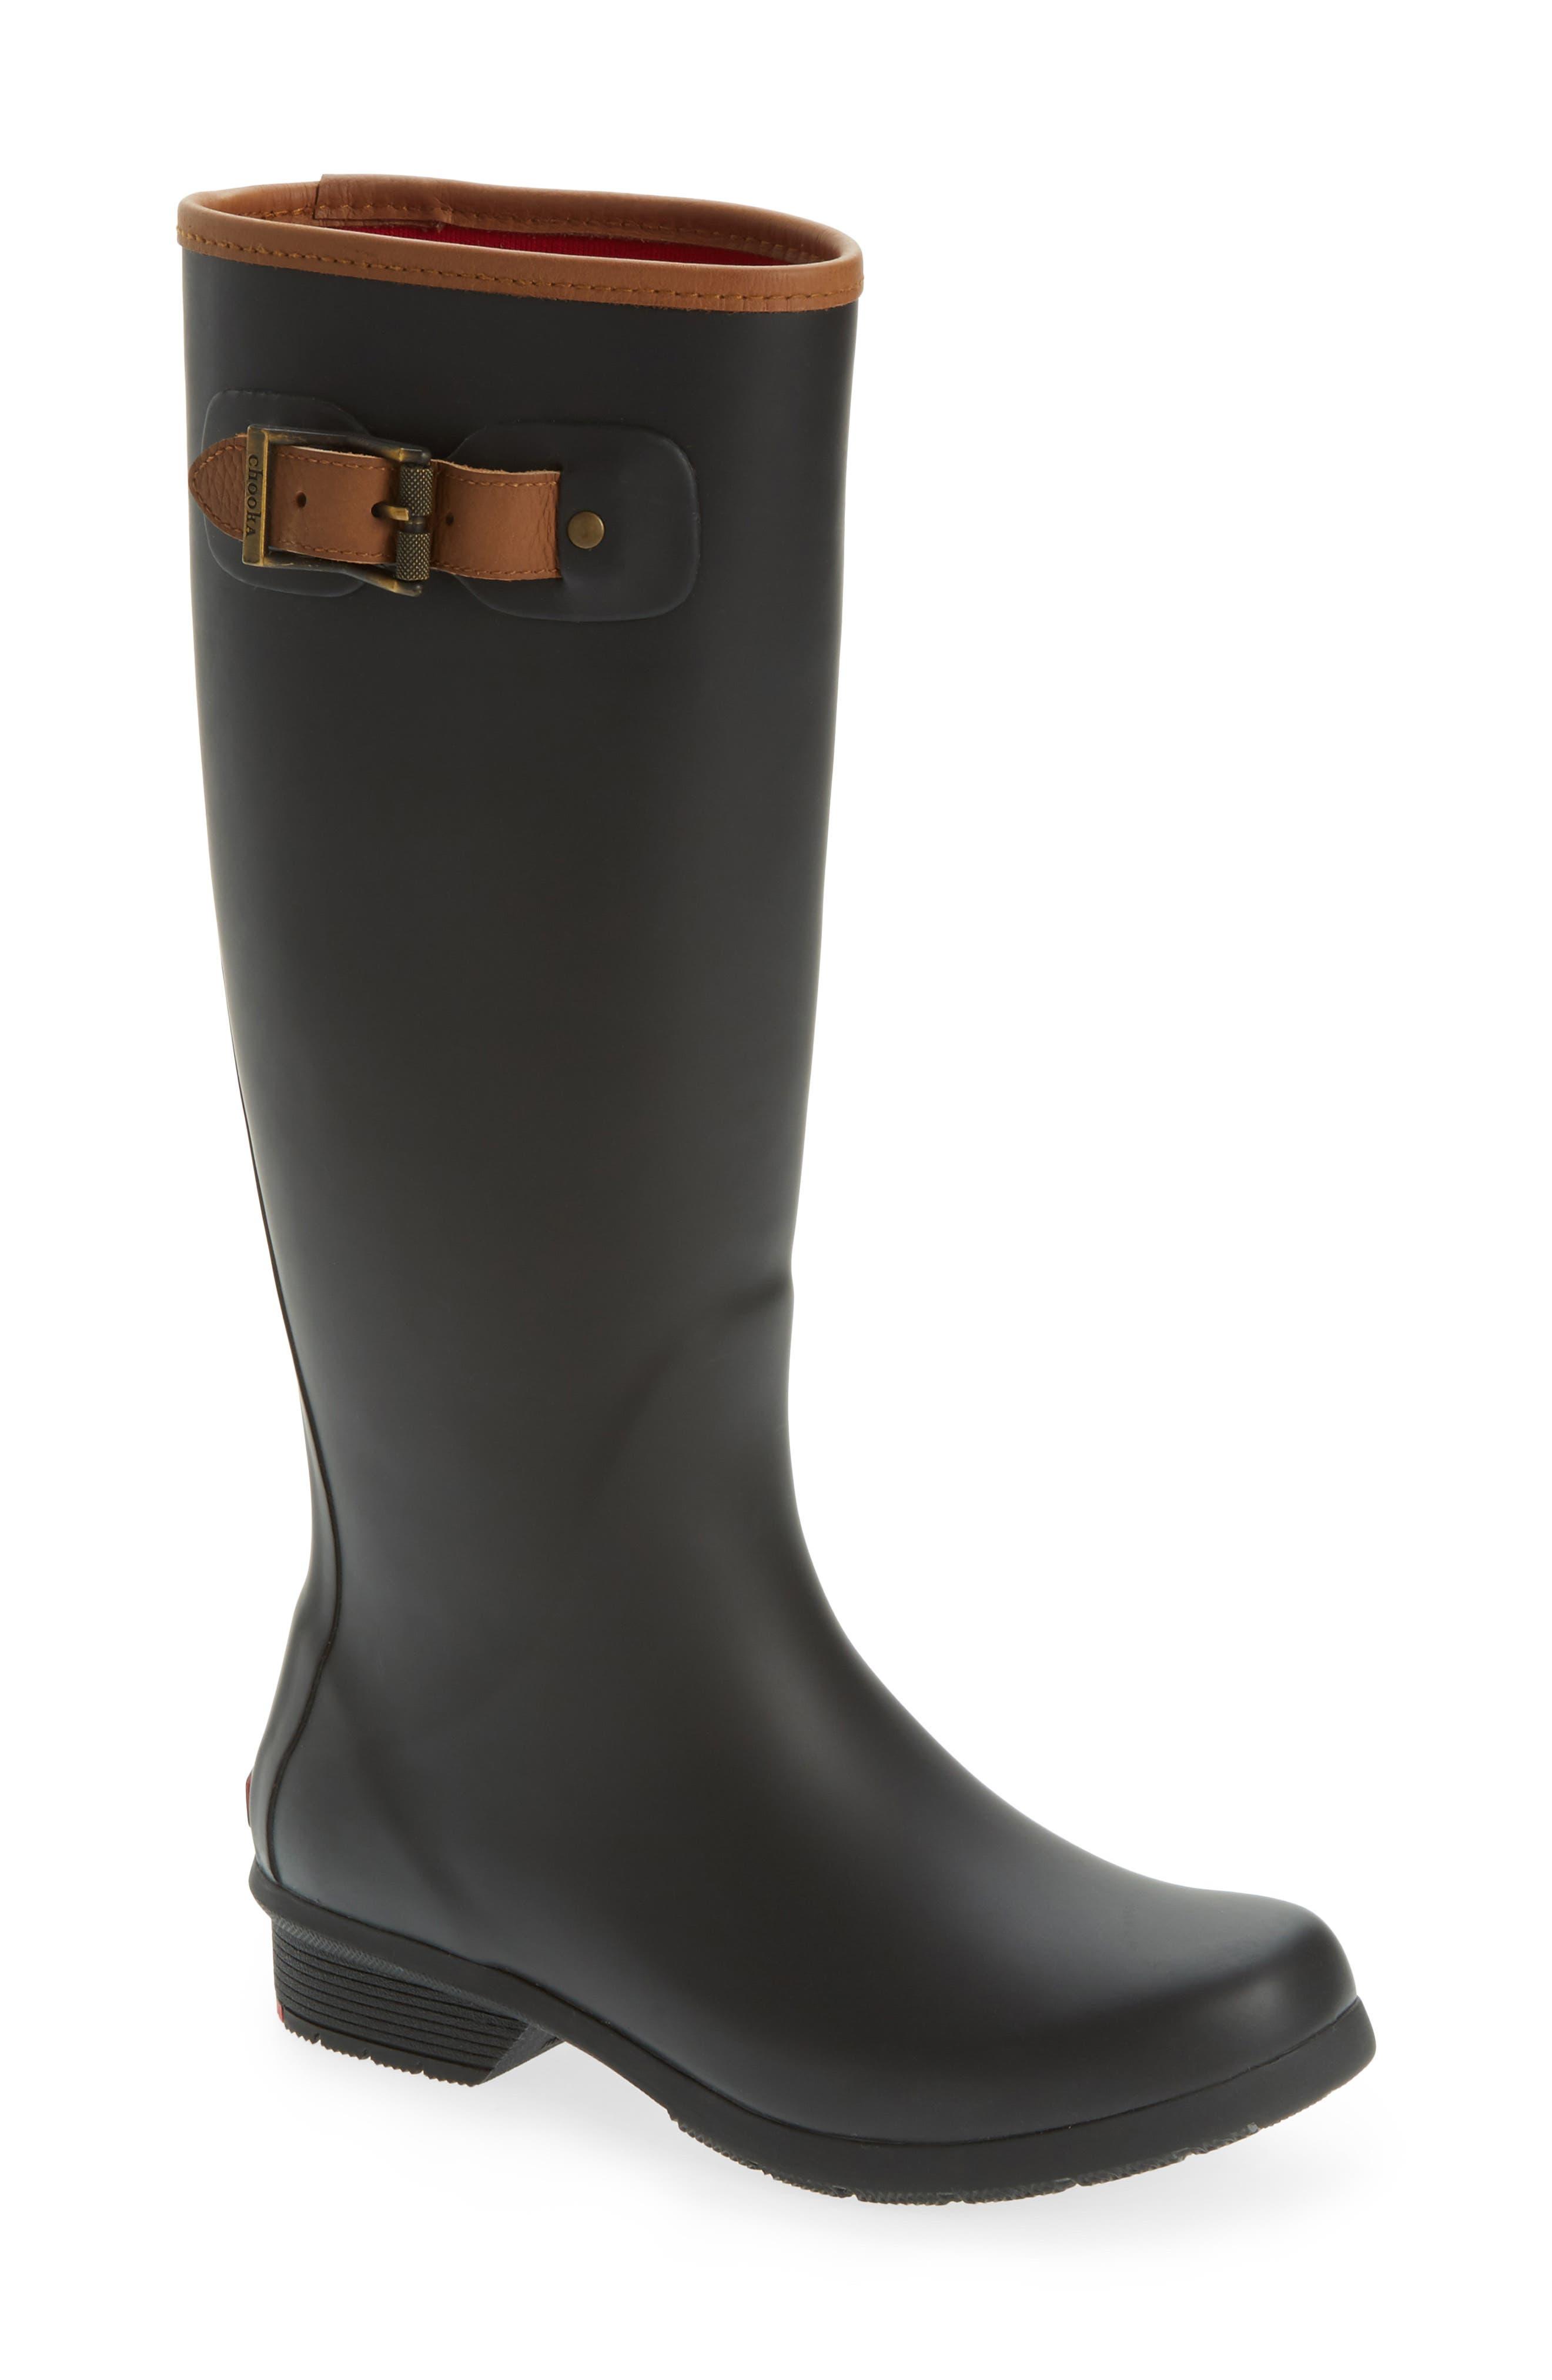 Main Image - Chooka City Tall Rain Boot (Women)